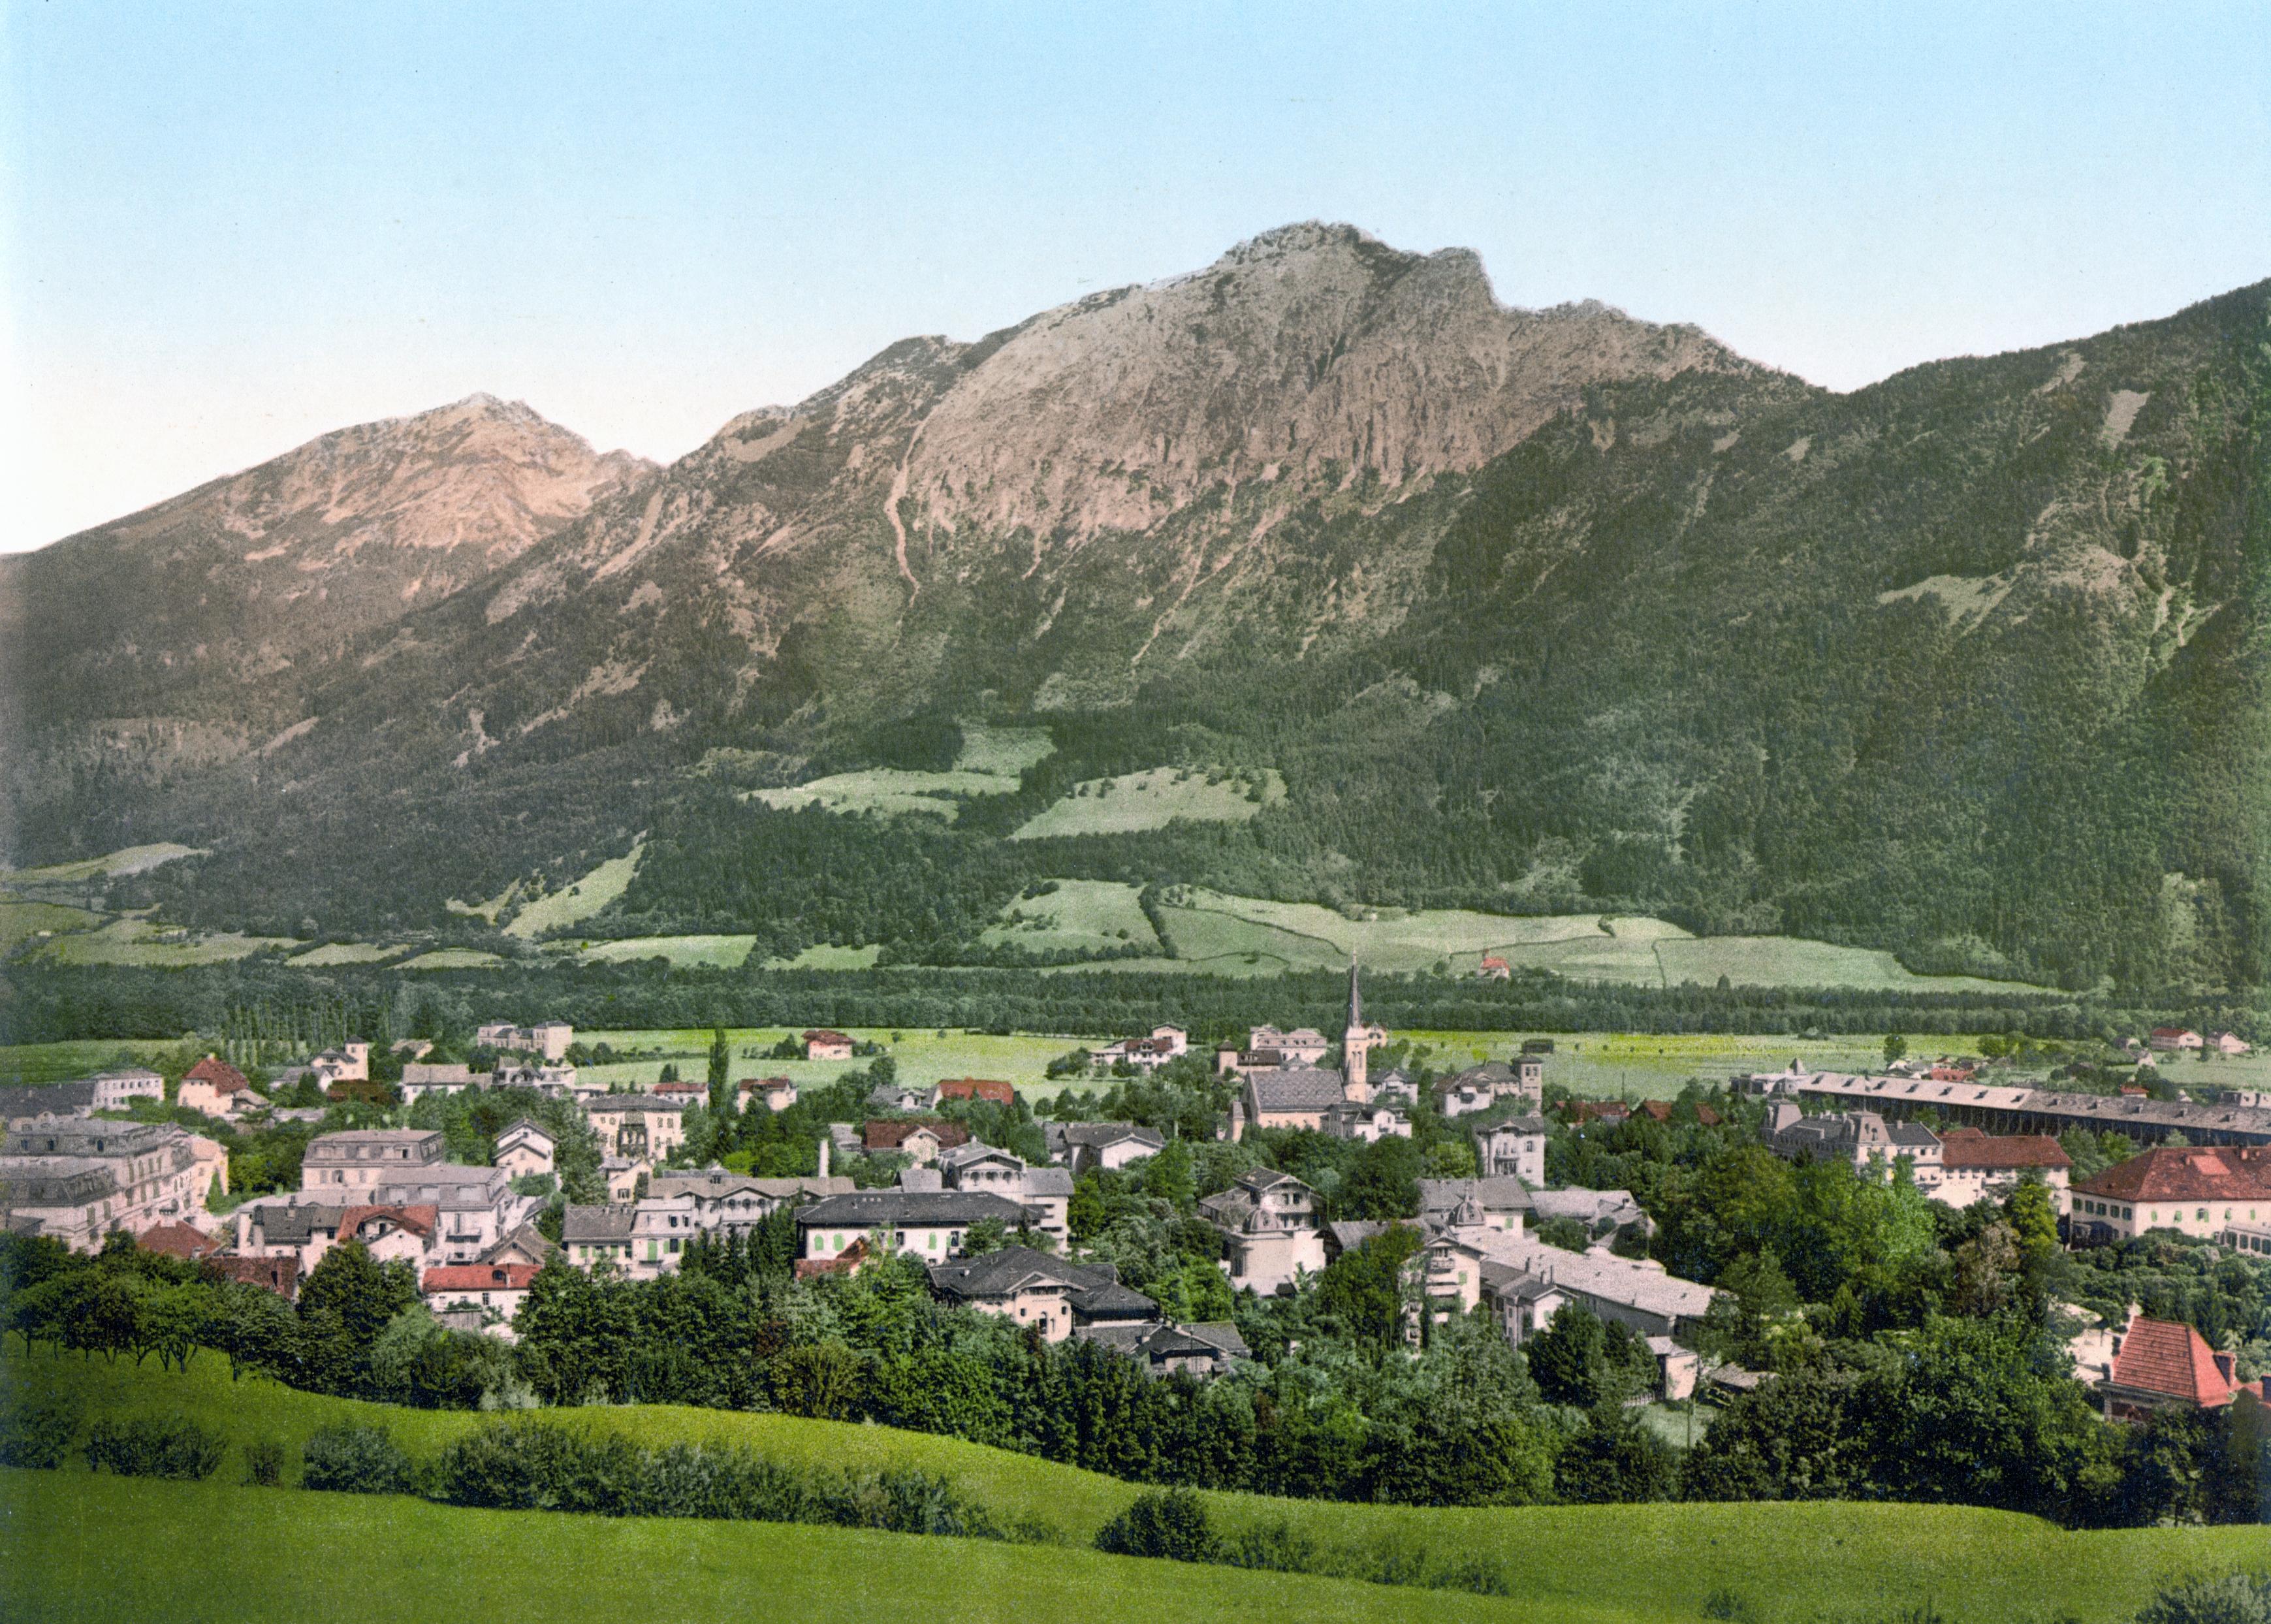 File:Bad Reichenhall 2 1900.jpg - Wikimedia Commons